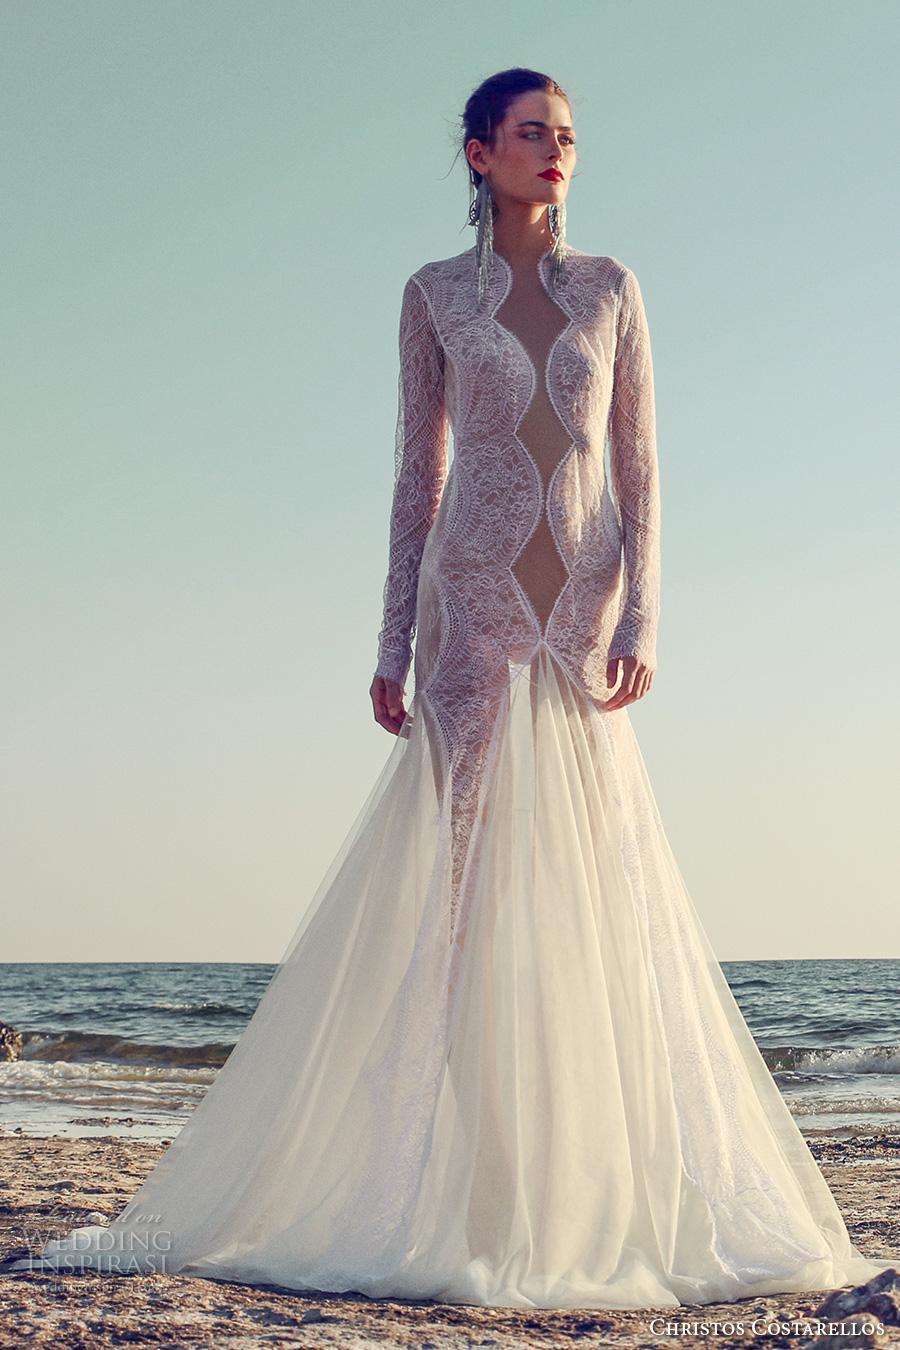 Lace Wedding Dresses Online 28 Popular christos costarellos fall bridal